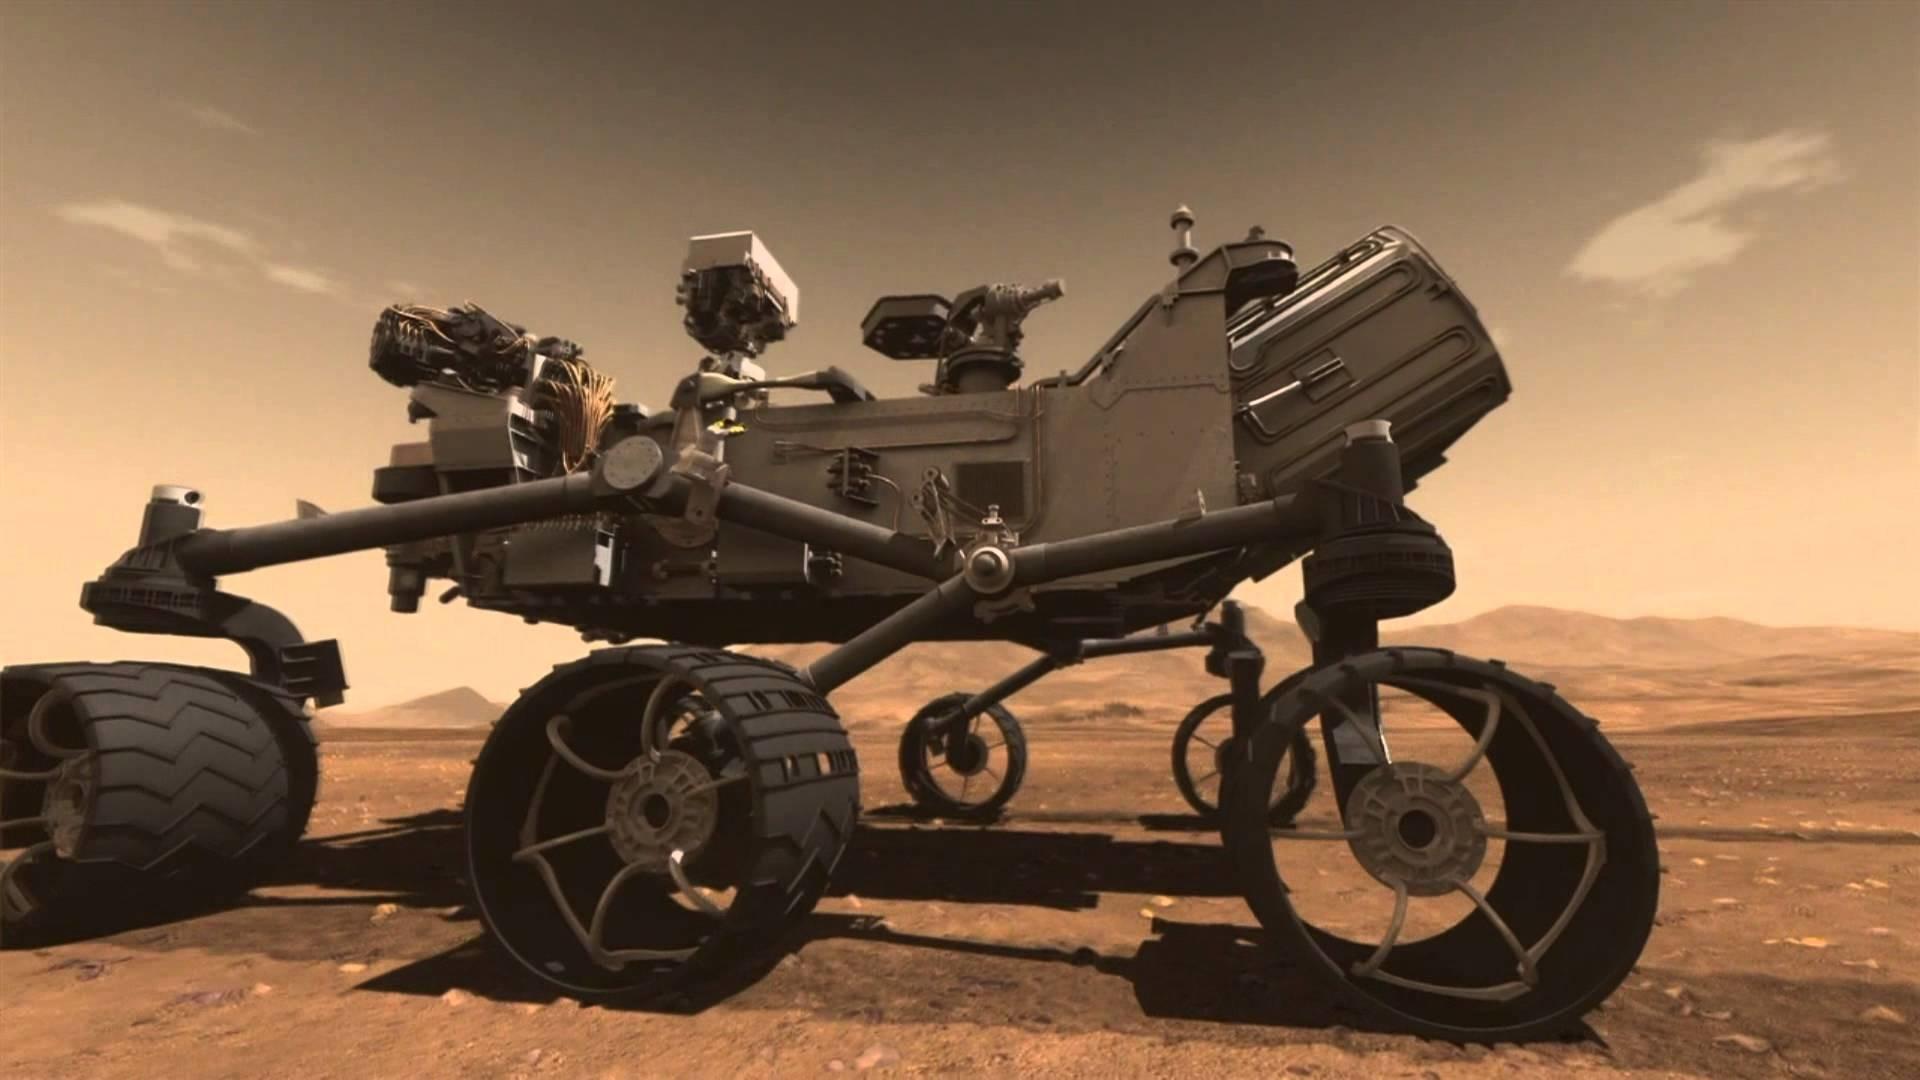 Res: 1920x1080, Mars Curiosity Rover Lands On Mars